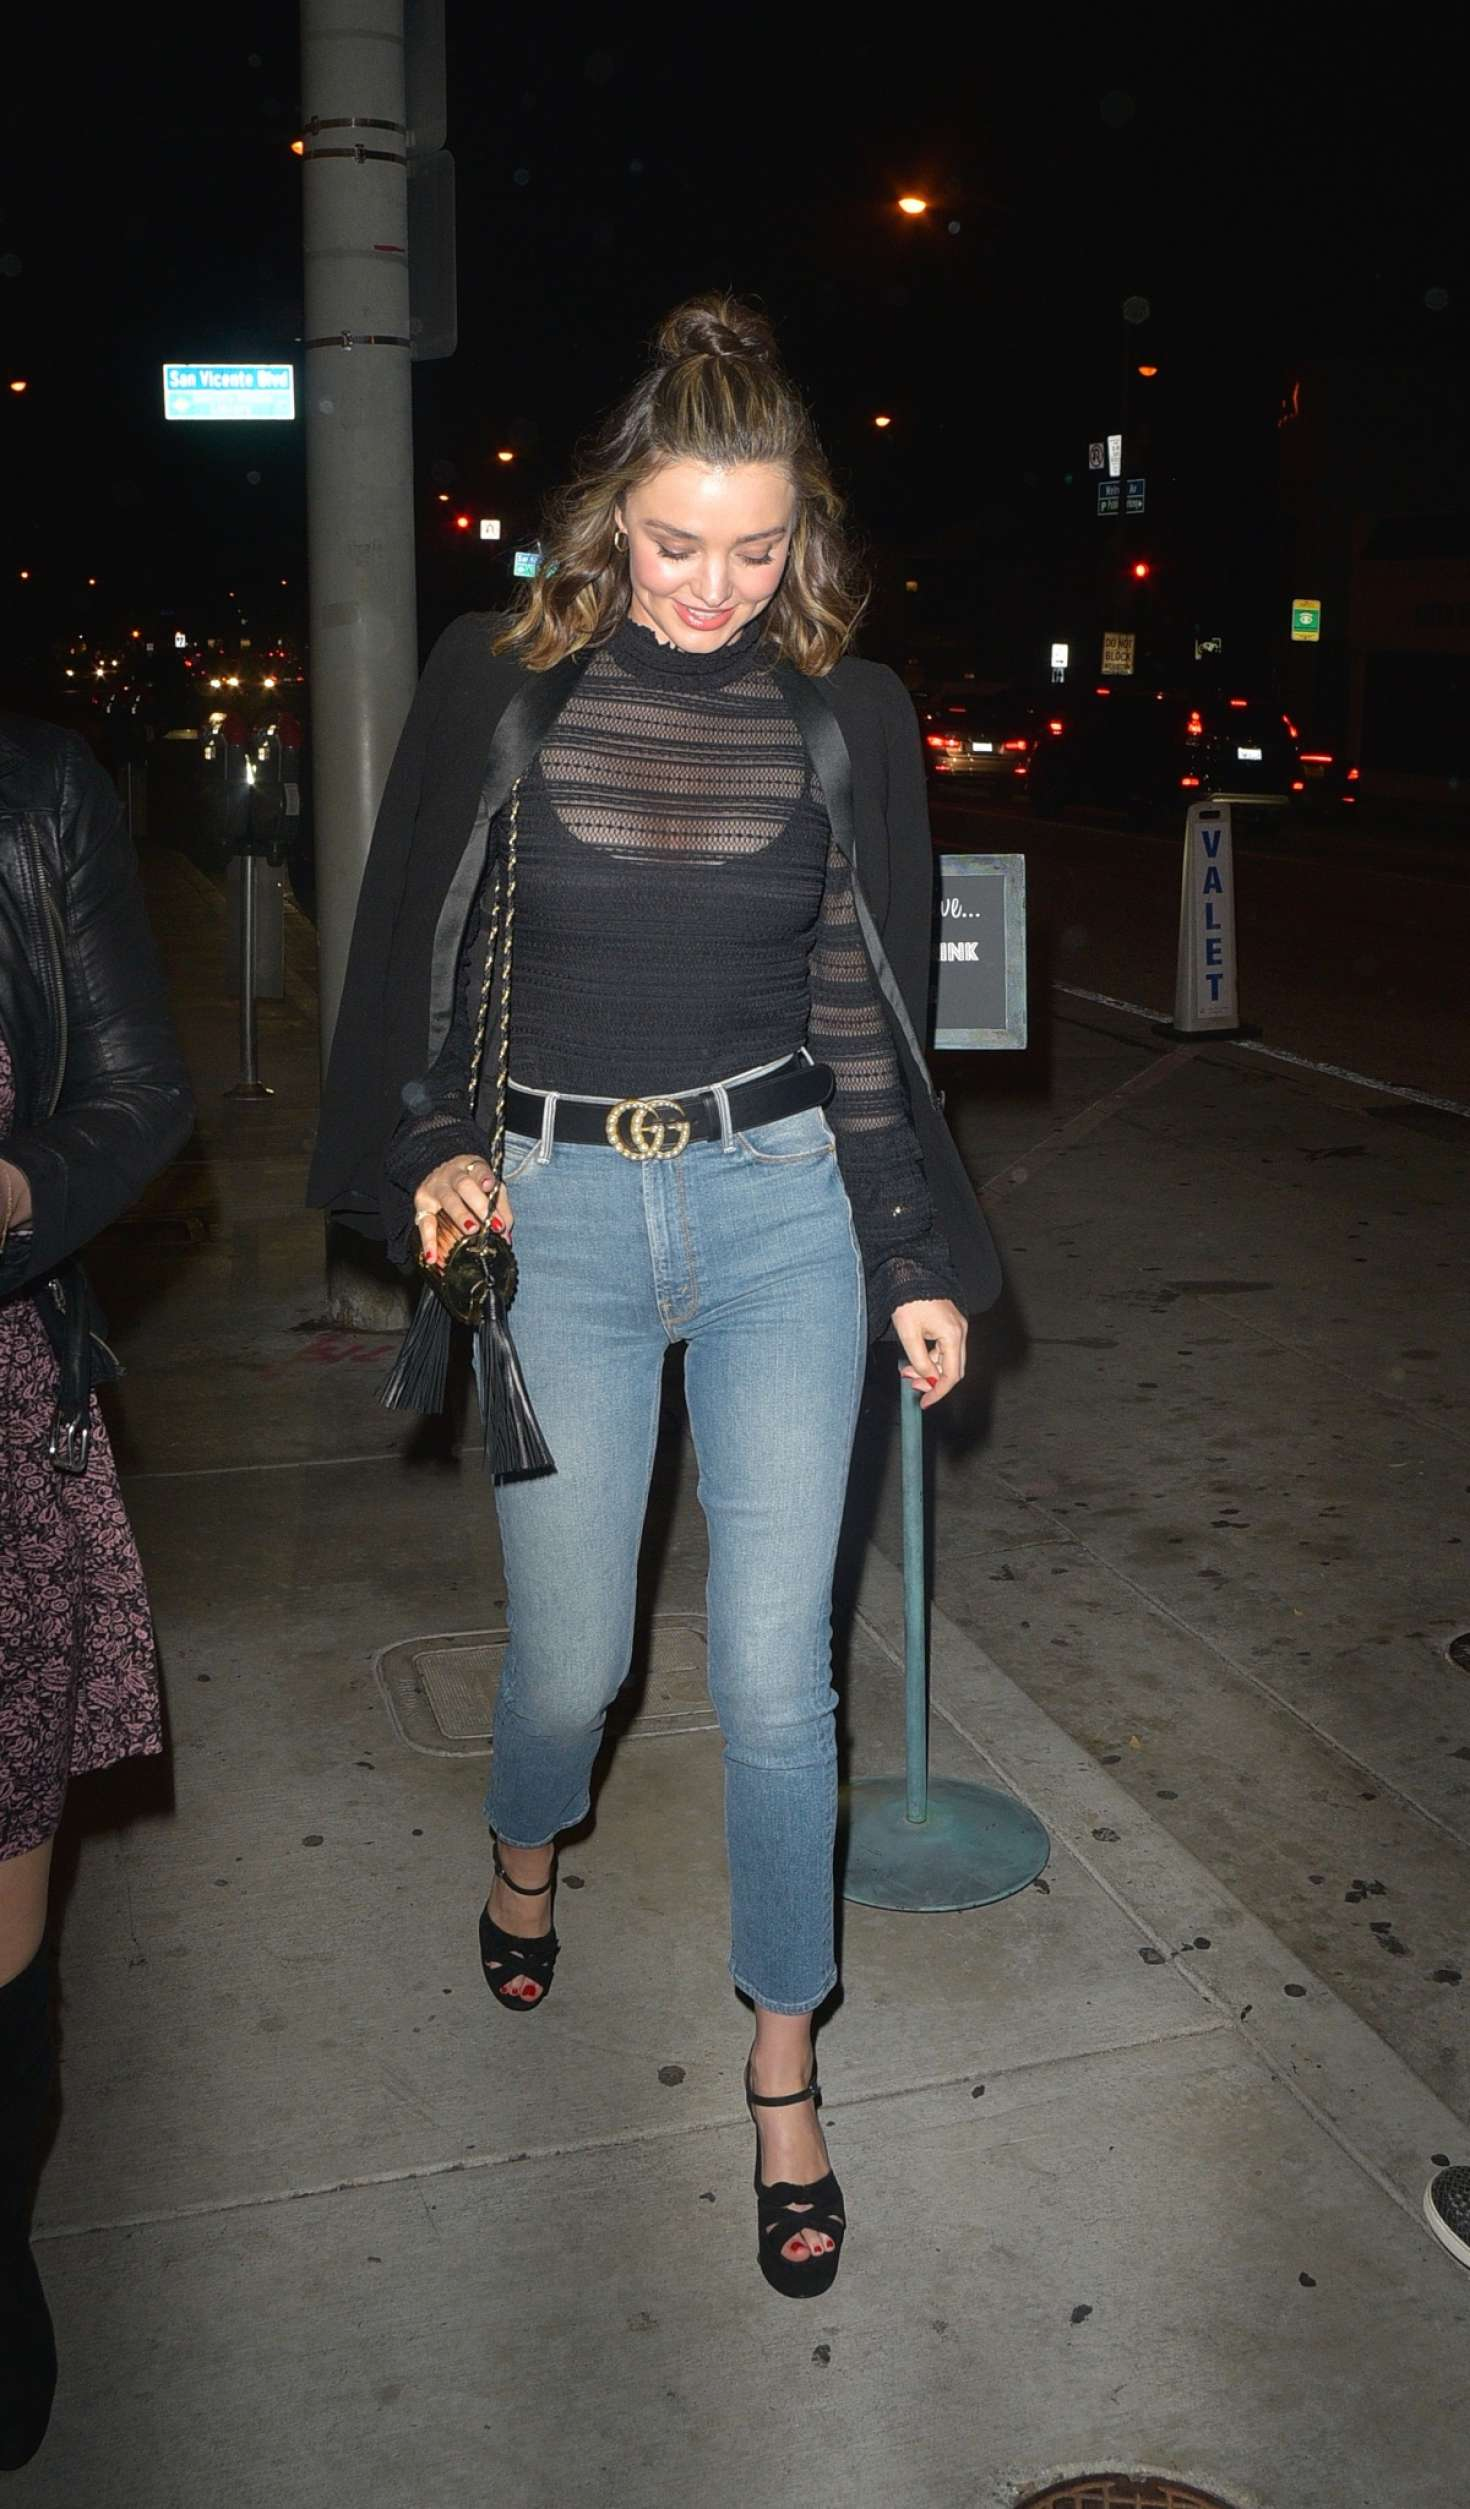 Miranda Kerr in sheer black top at Catch LA in West Hollywood